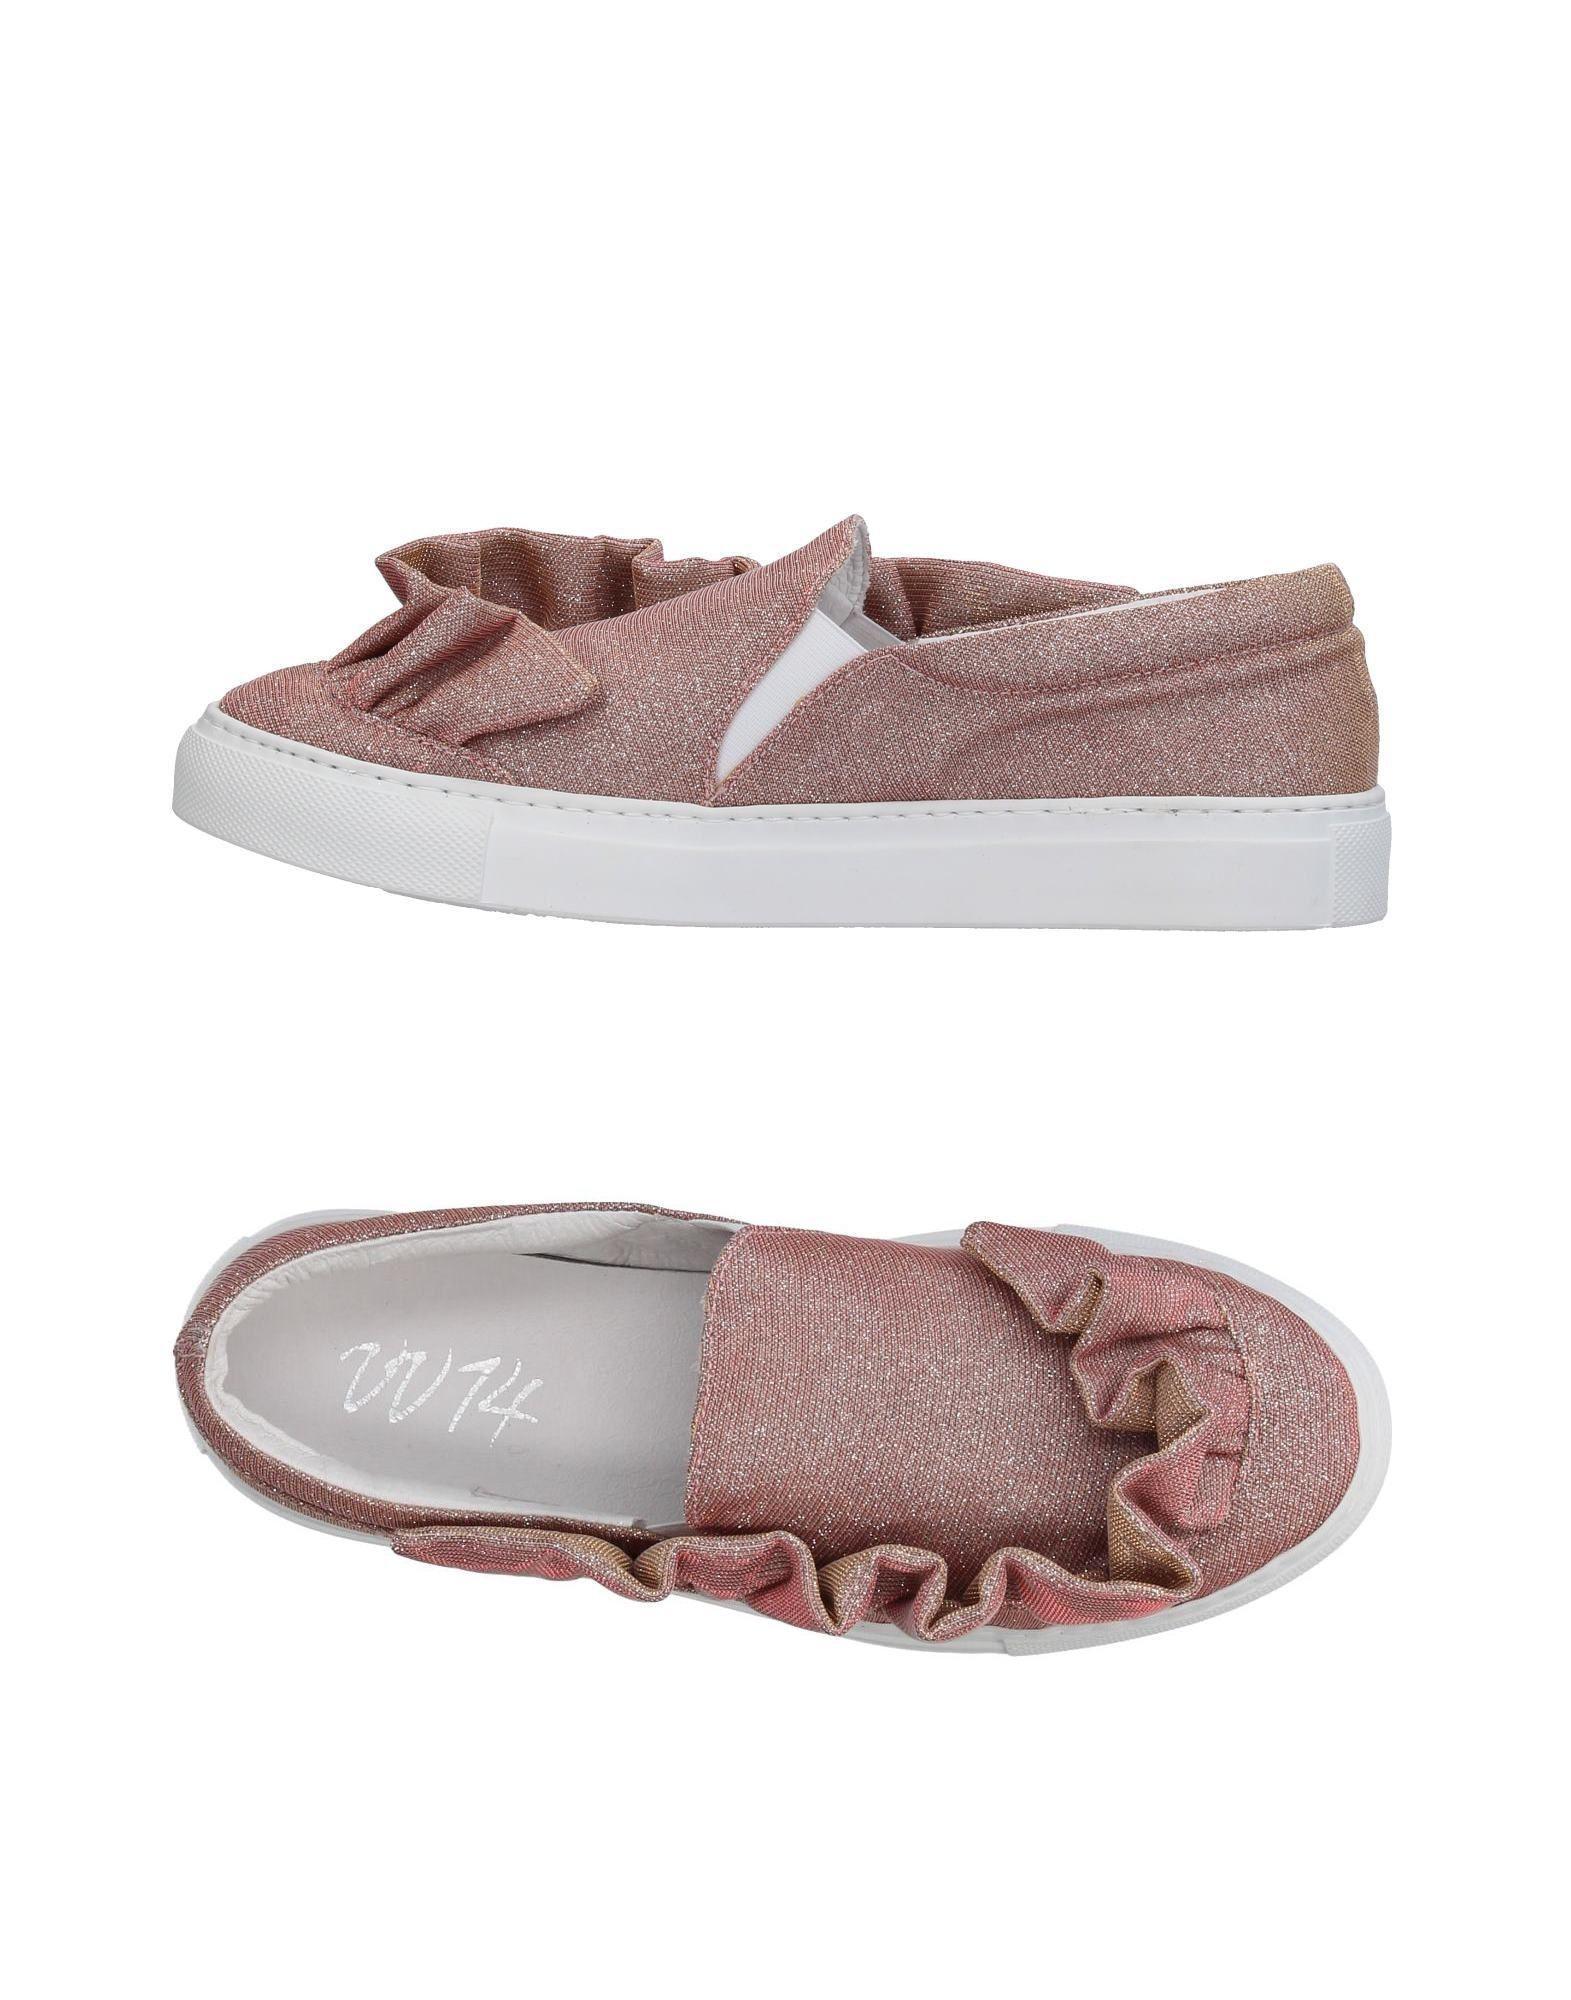 Ballerines Via Vela 14 - Chaussures YMRQfIG